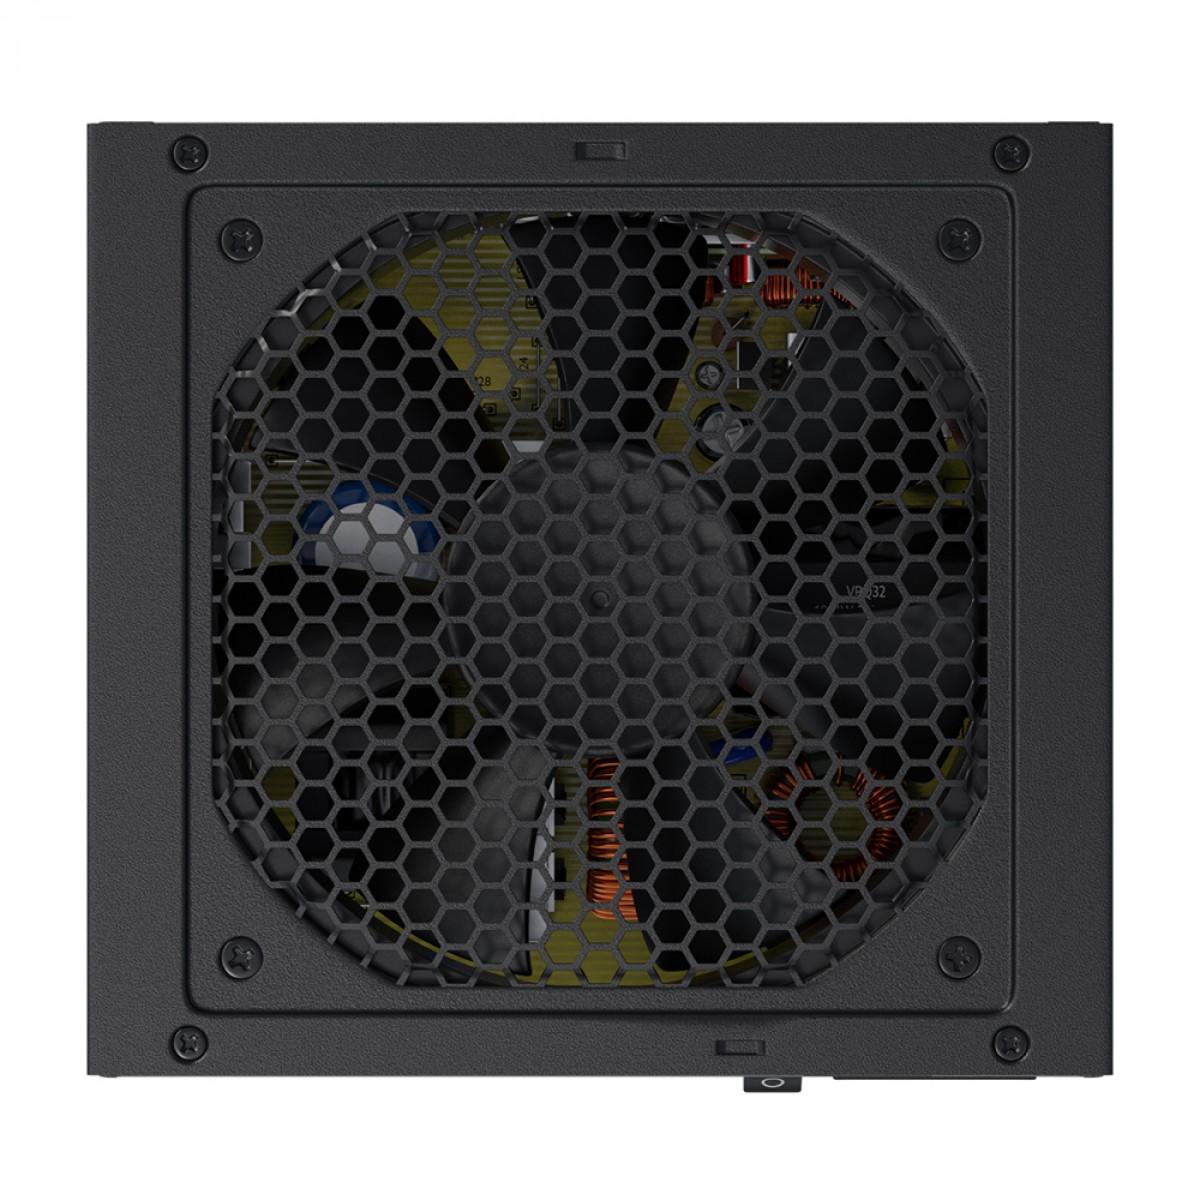 Fonte Seasonic Core GX-650, 650W, 80 Plus Gold, Full Modular